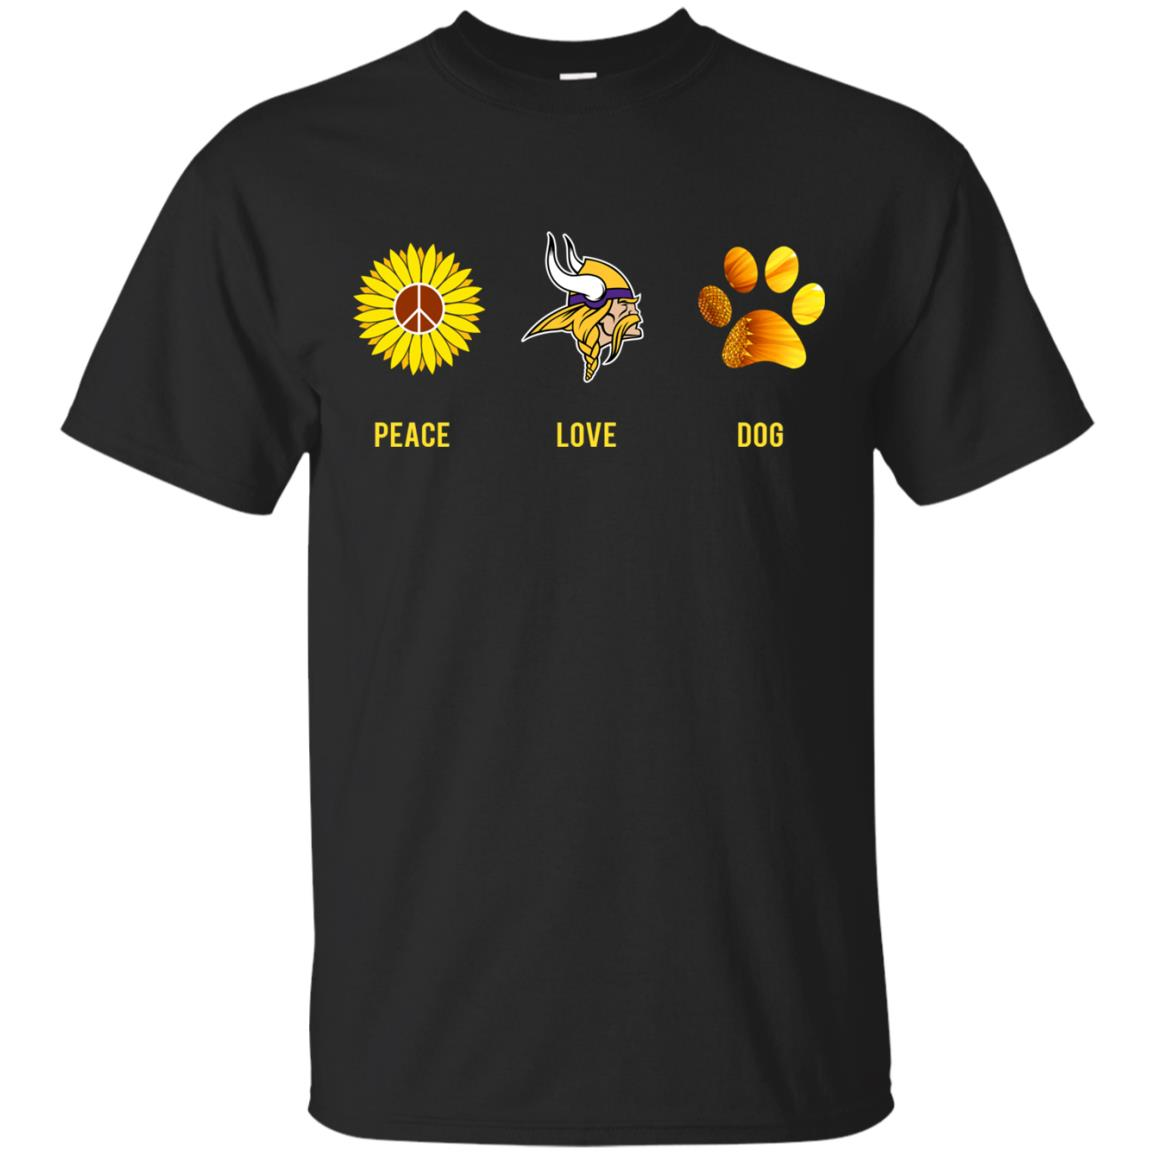 94b083a7d Minnesota Vikings peace love dog t-shirt, hoodie, ladies tee